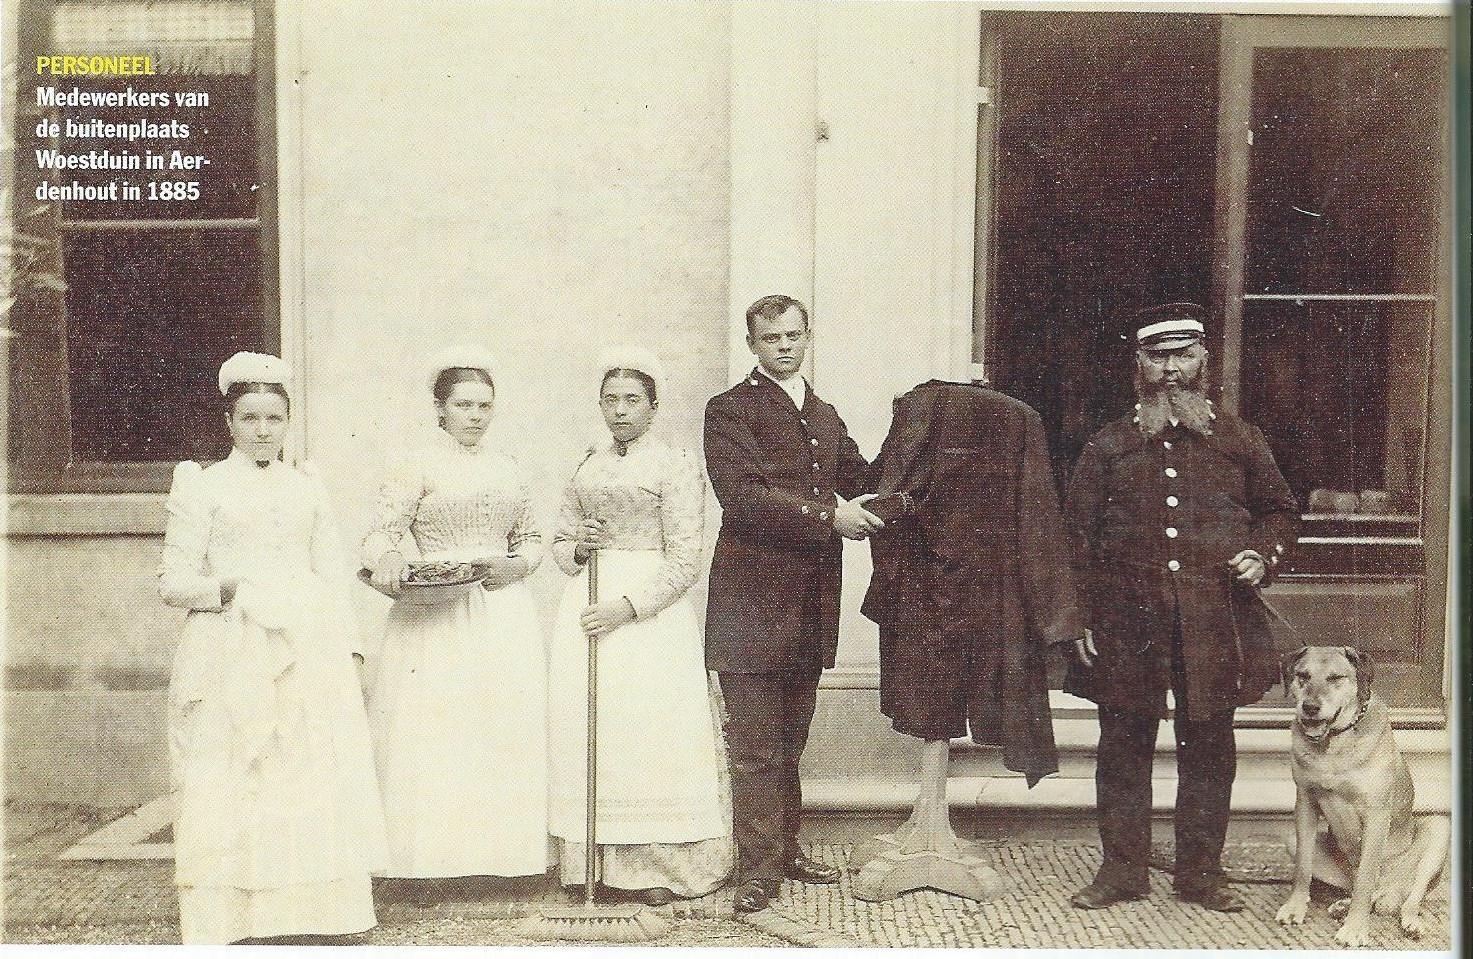 Personeel van Woestduin in 1885